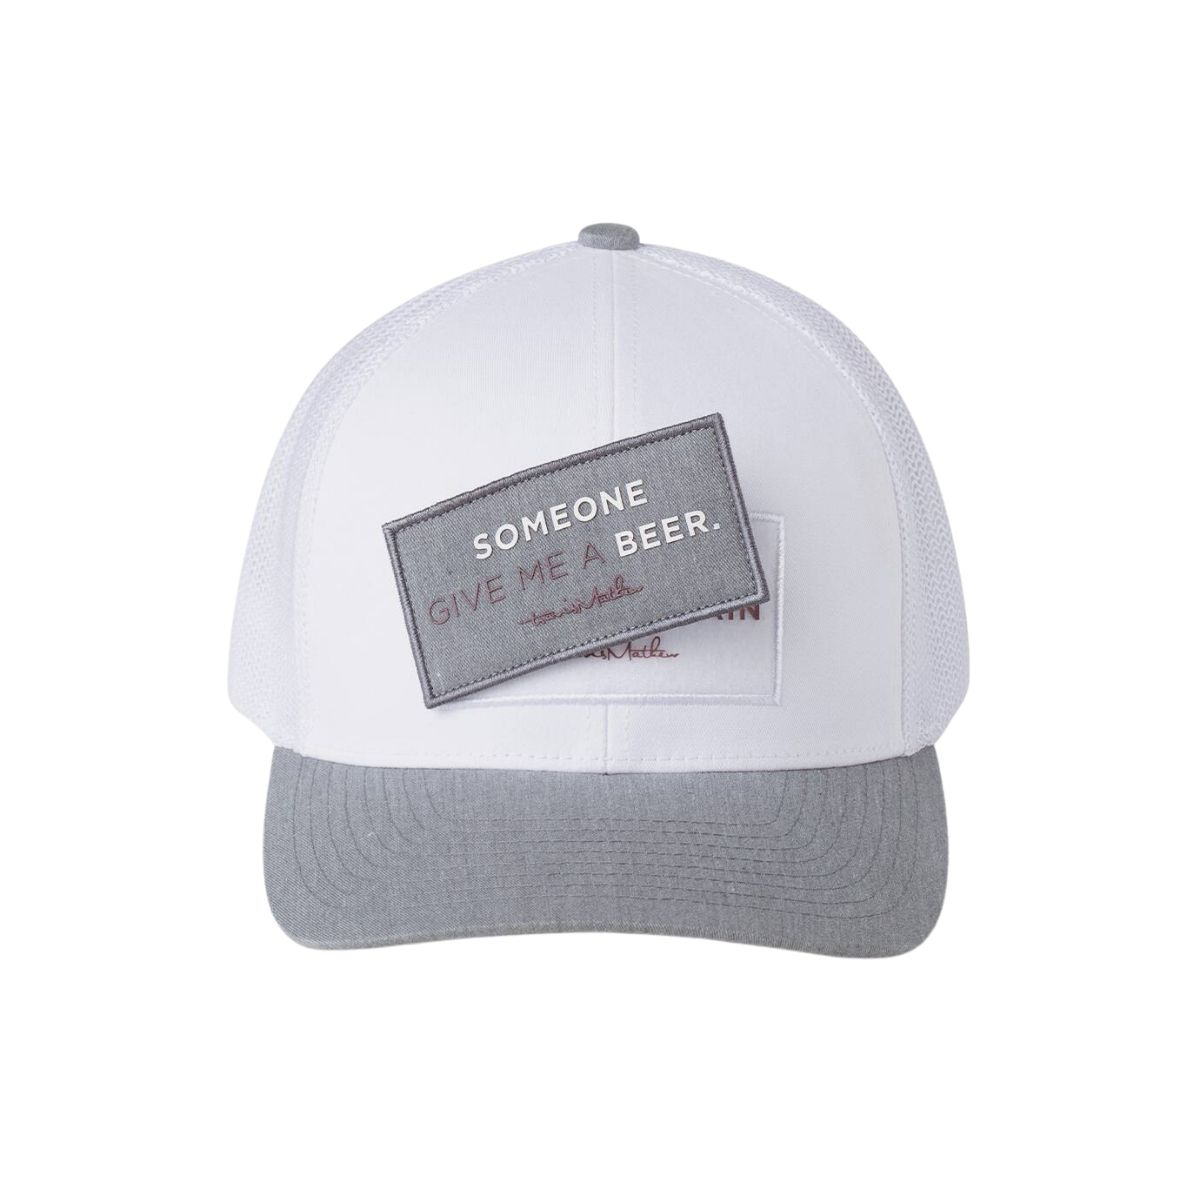 TravisMathew Barfly Snapback Hat